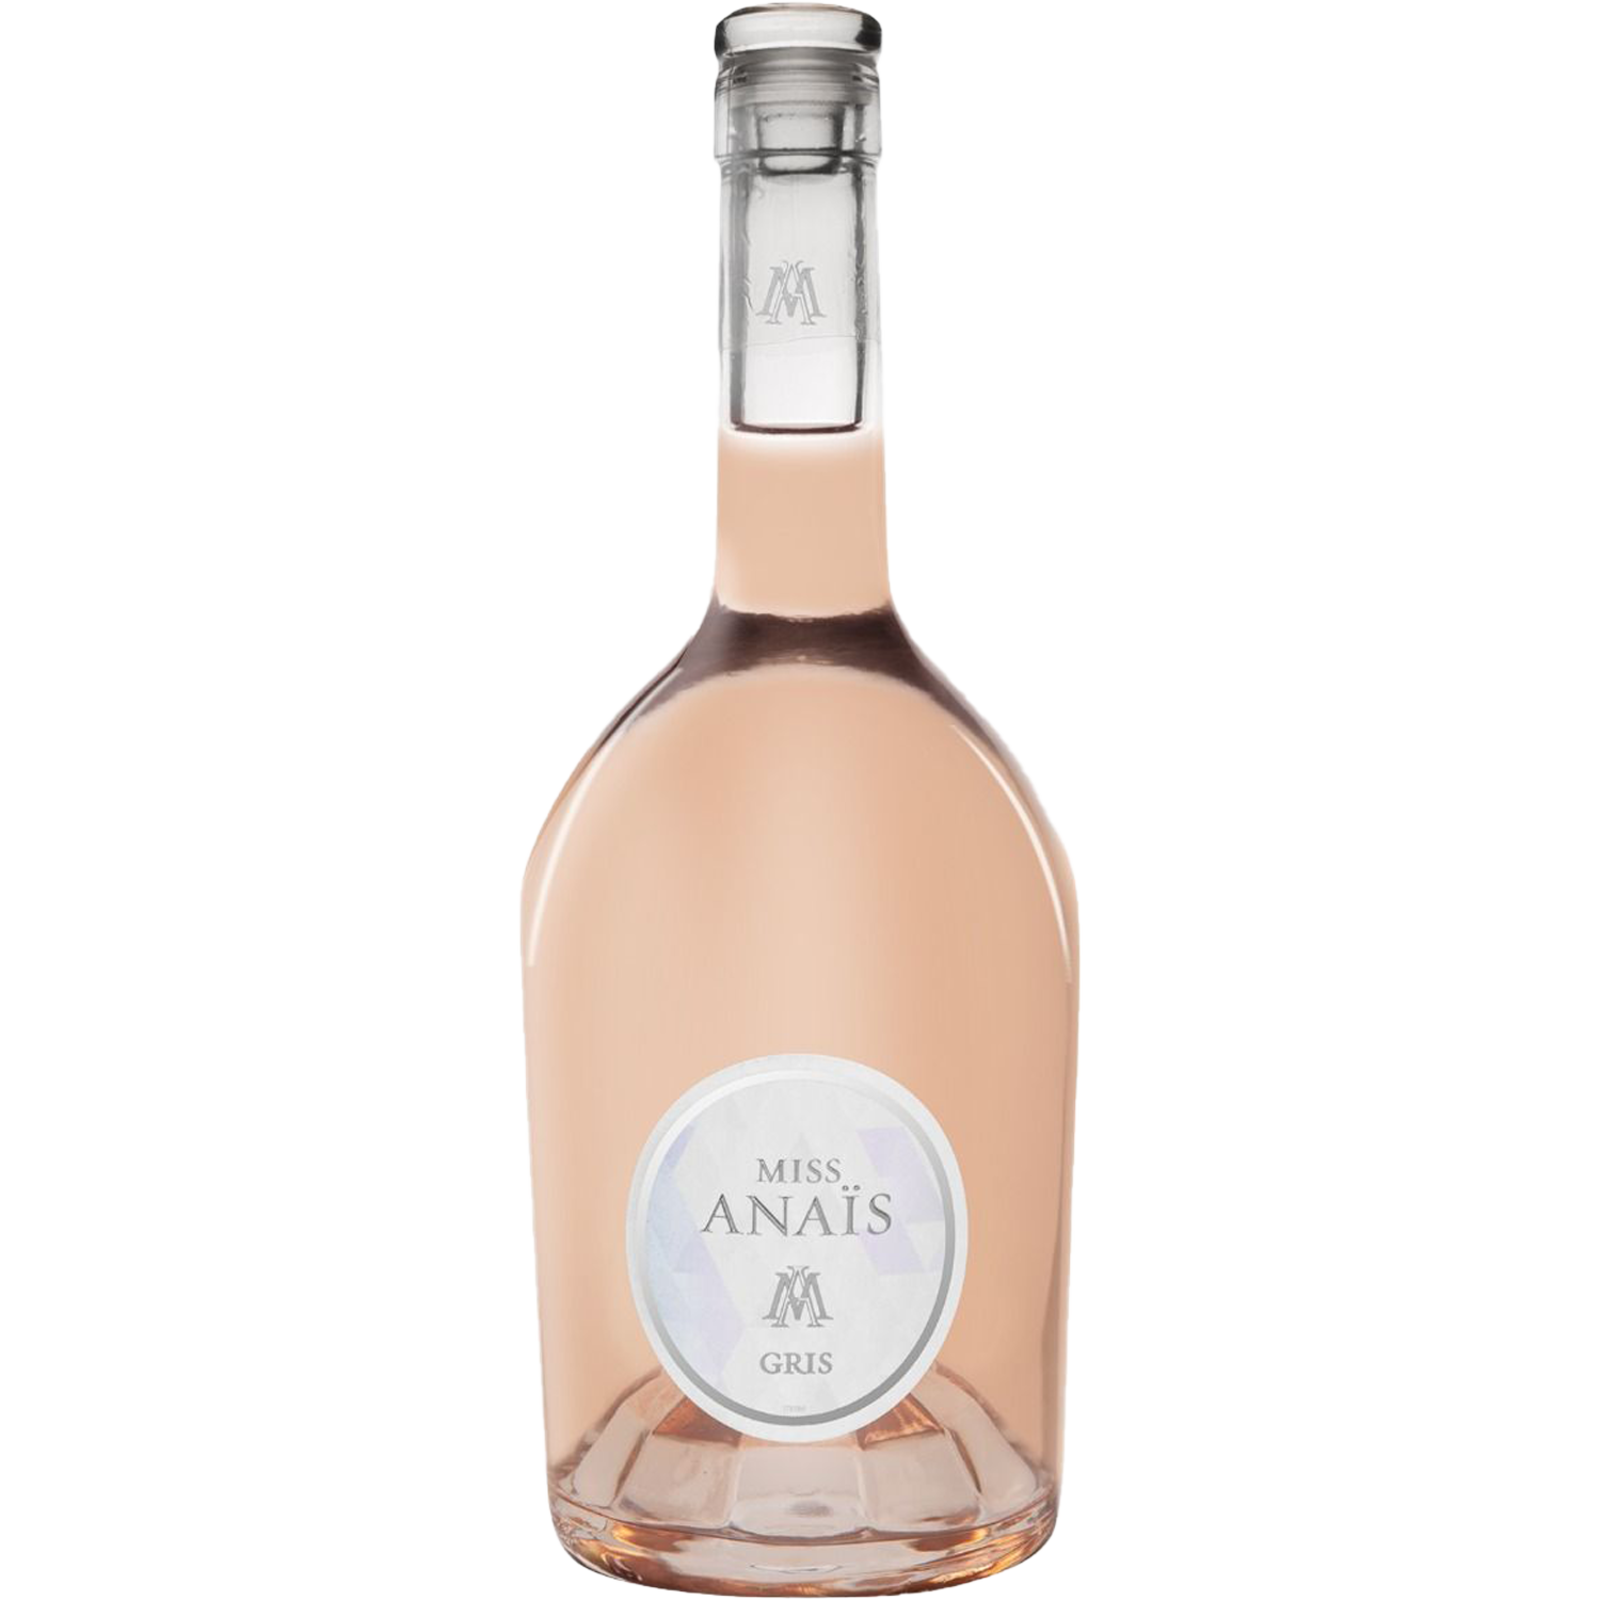 Miss Anaïs Miss Anaïs Grenache Gris Rosé 2019